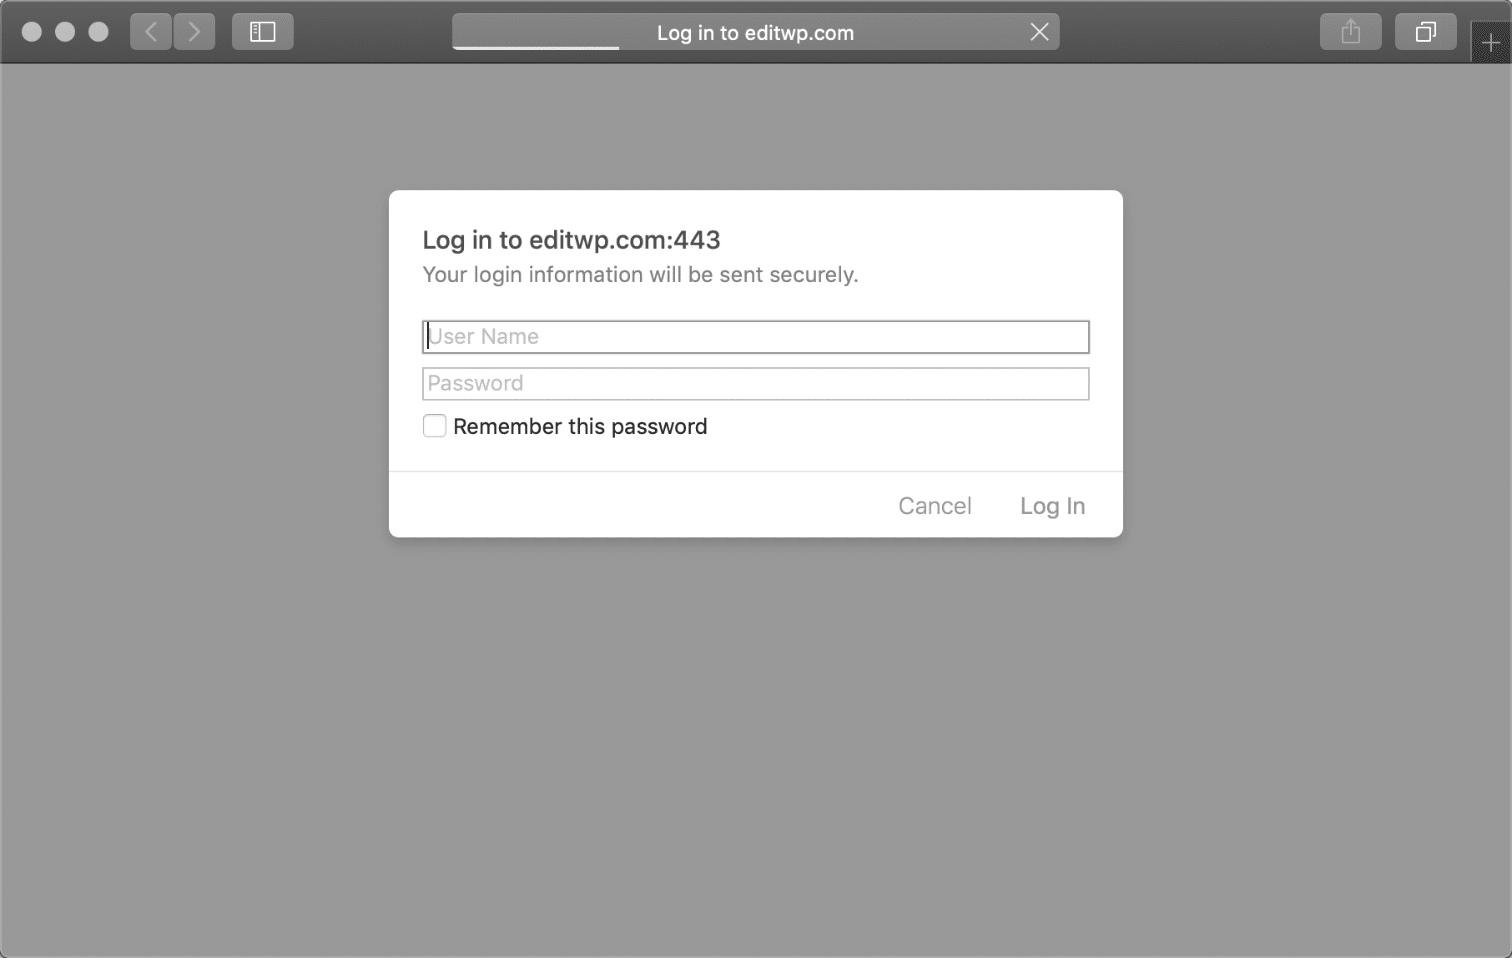 .htpasswd login prompt in Safari